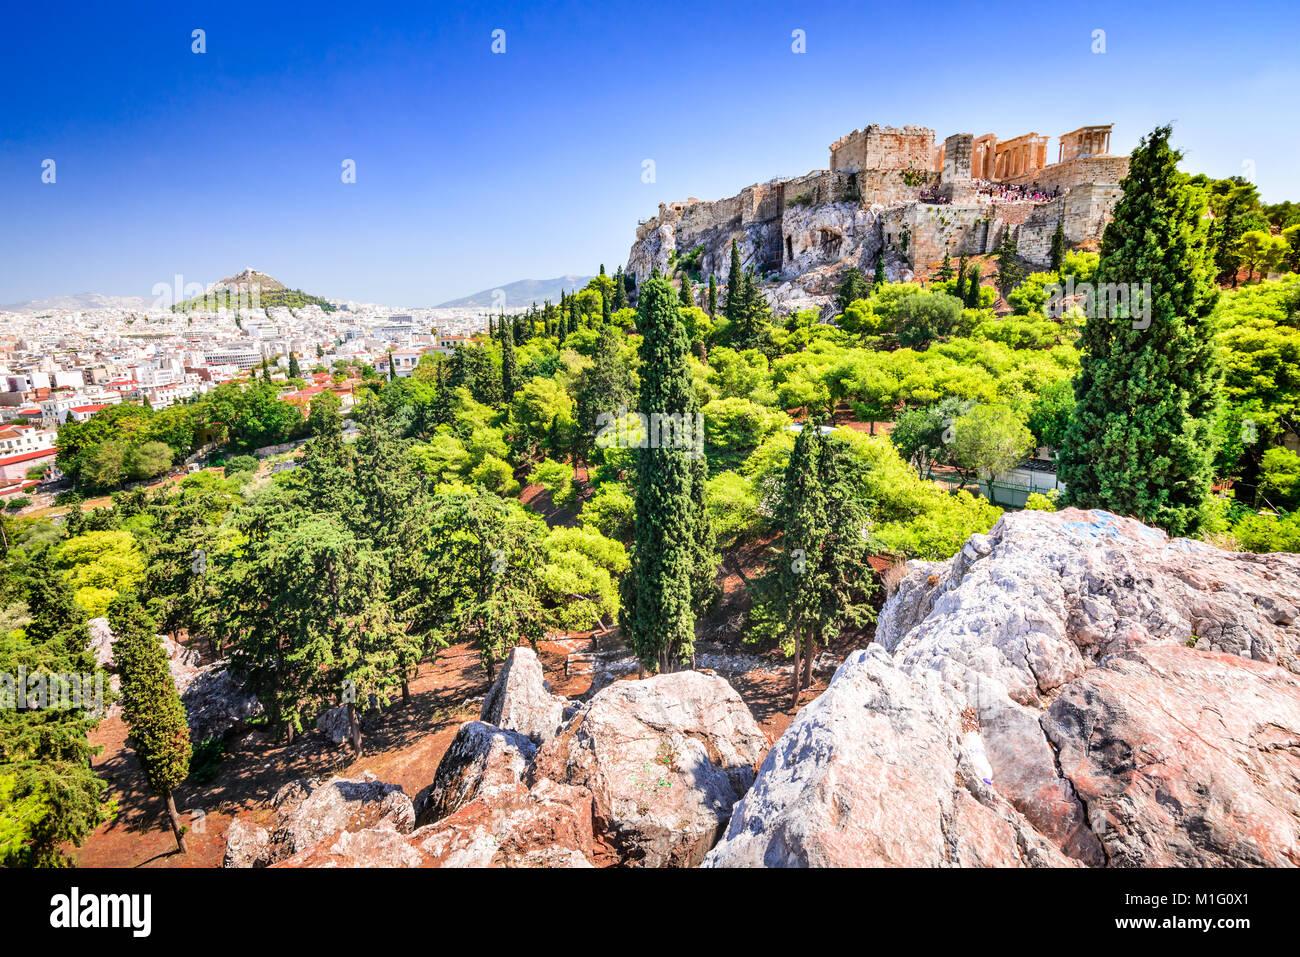 Athens, Greece. Acropolis, ancient ruins of Greek Civilization citadel with Erechtheion temple. - Stock Image